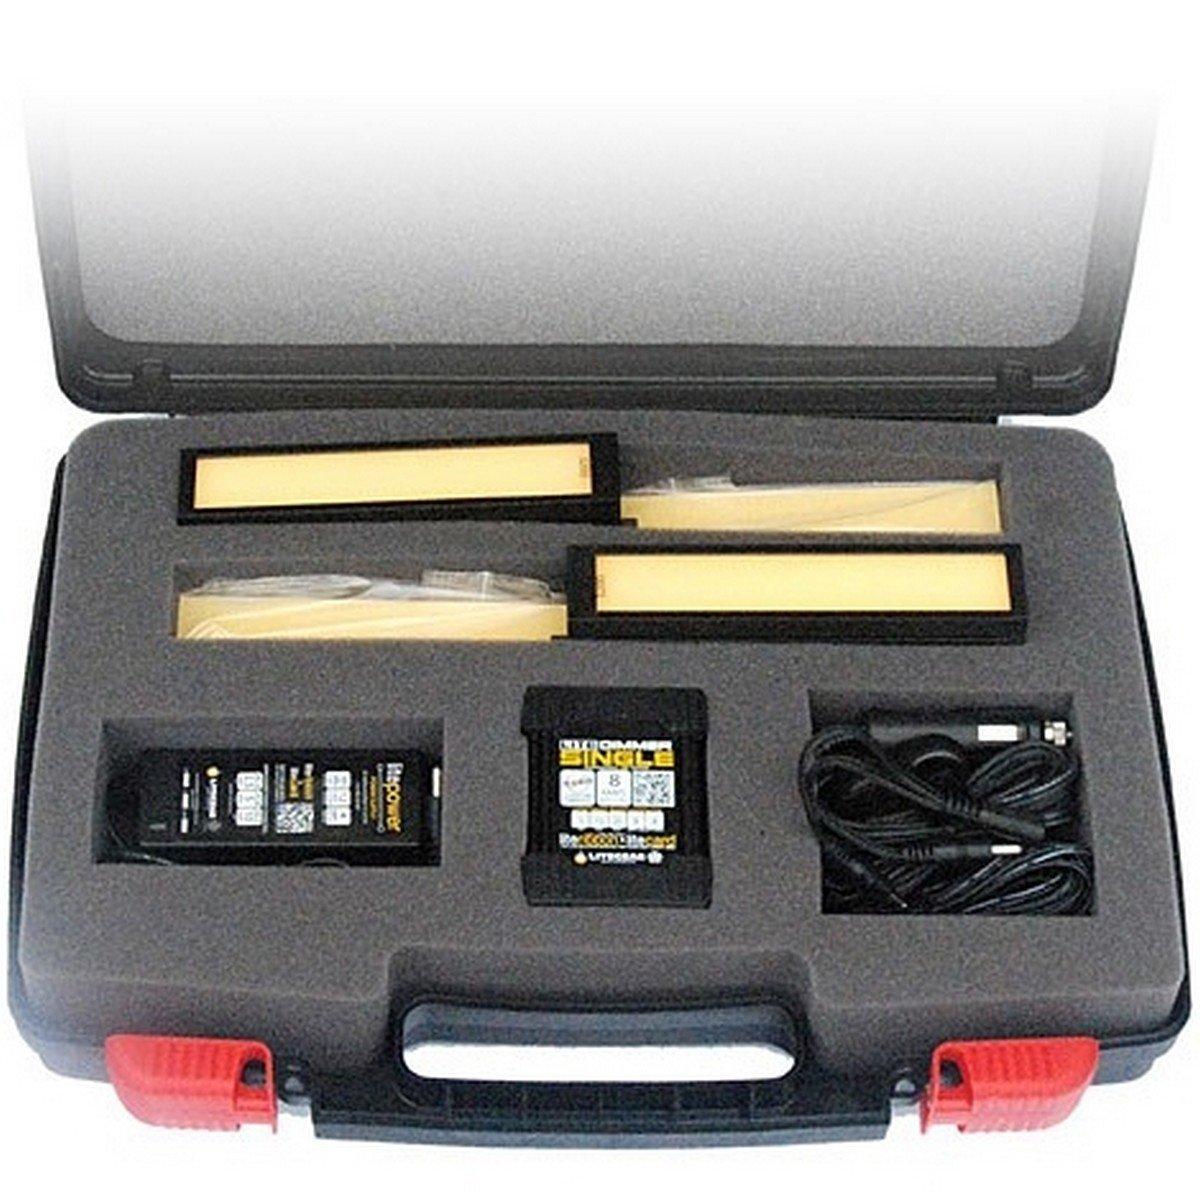 Cineo Lighting Matchstix Double Power Kit   Versatile Light Source 6inch 701.0206